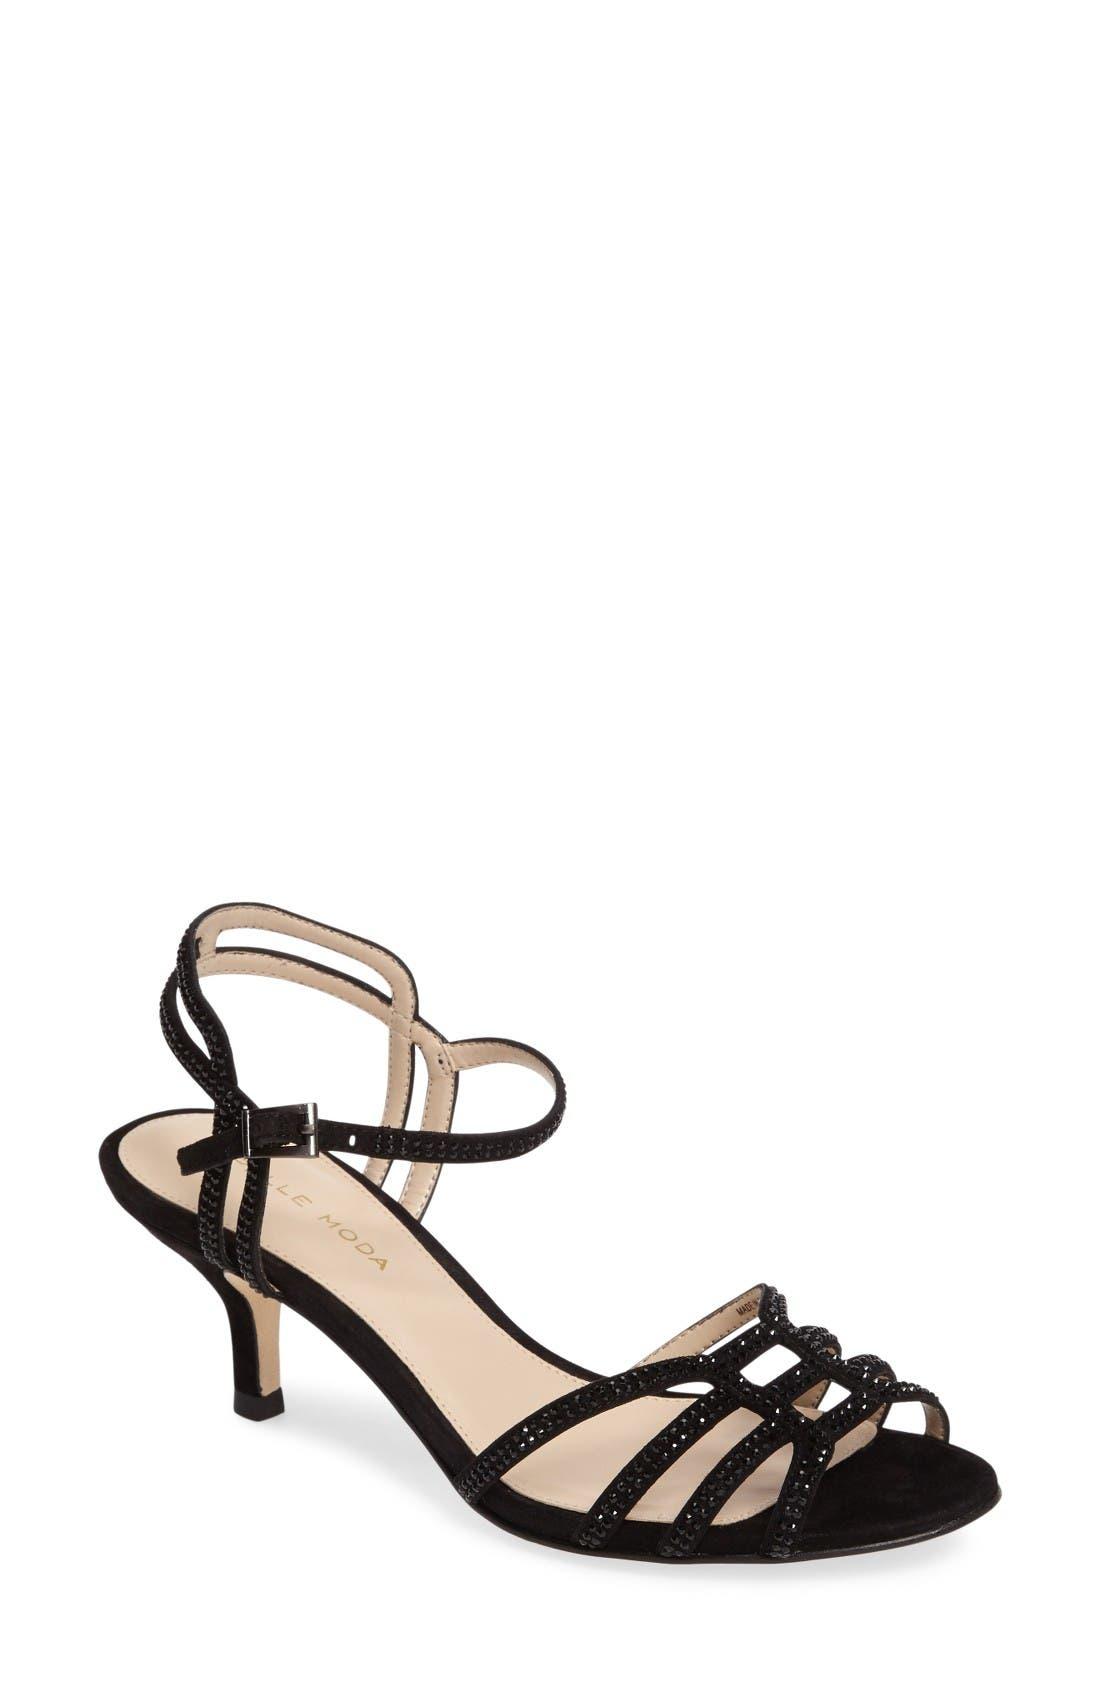 PELLE MODA Alia Embellished Strappy Sandal